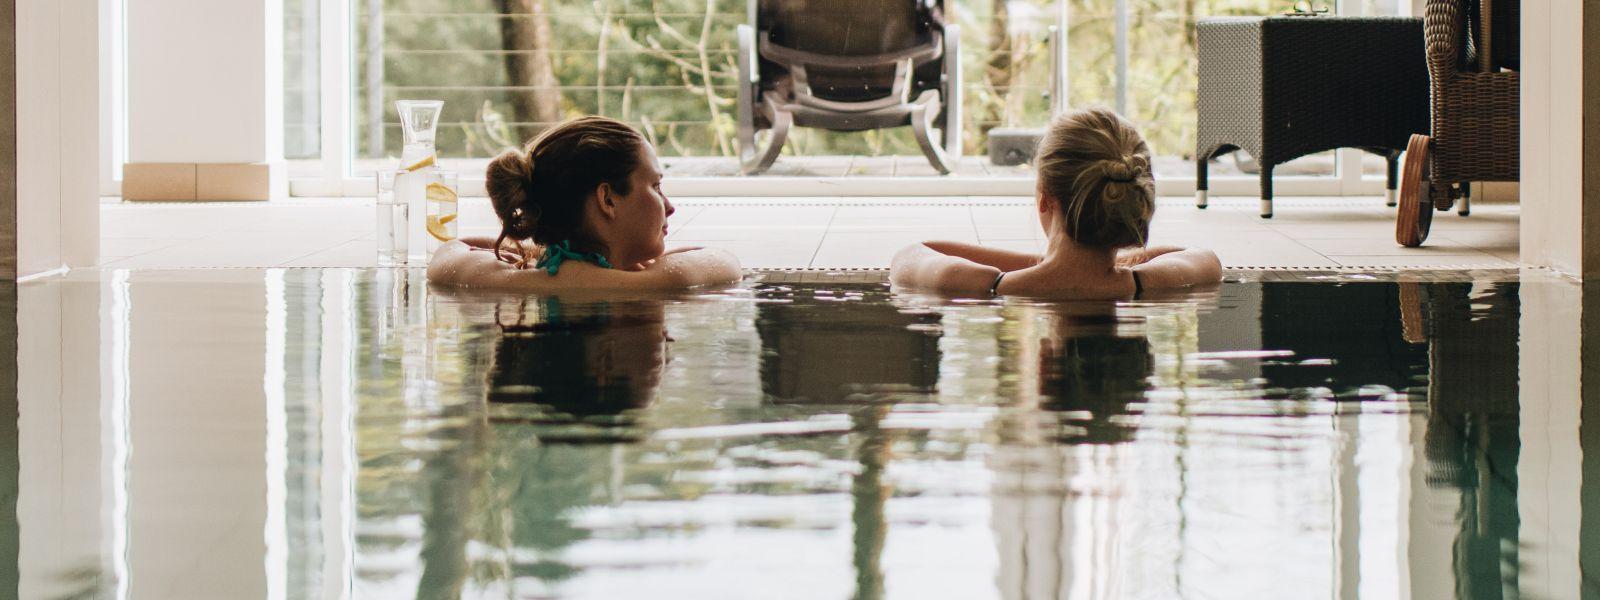 Zwei Freundinnen beim Gespräch am Poolrand